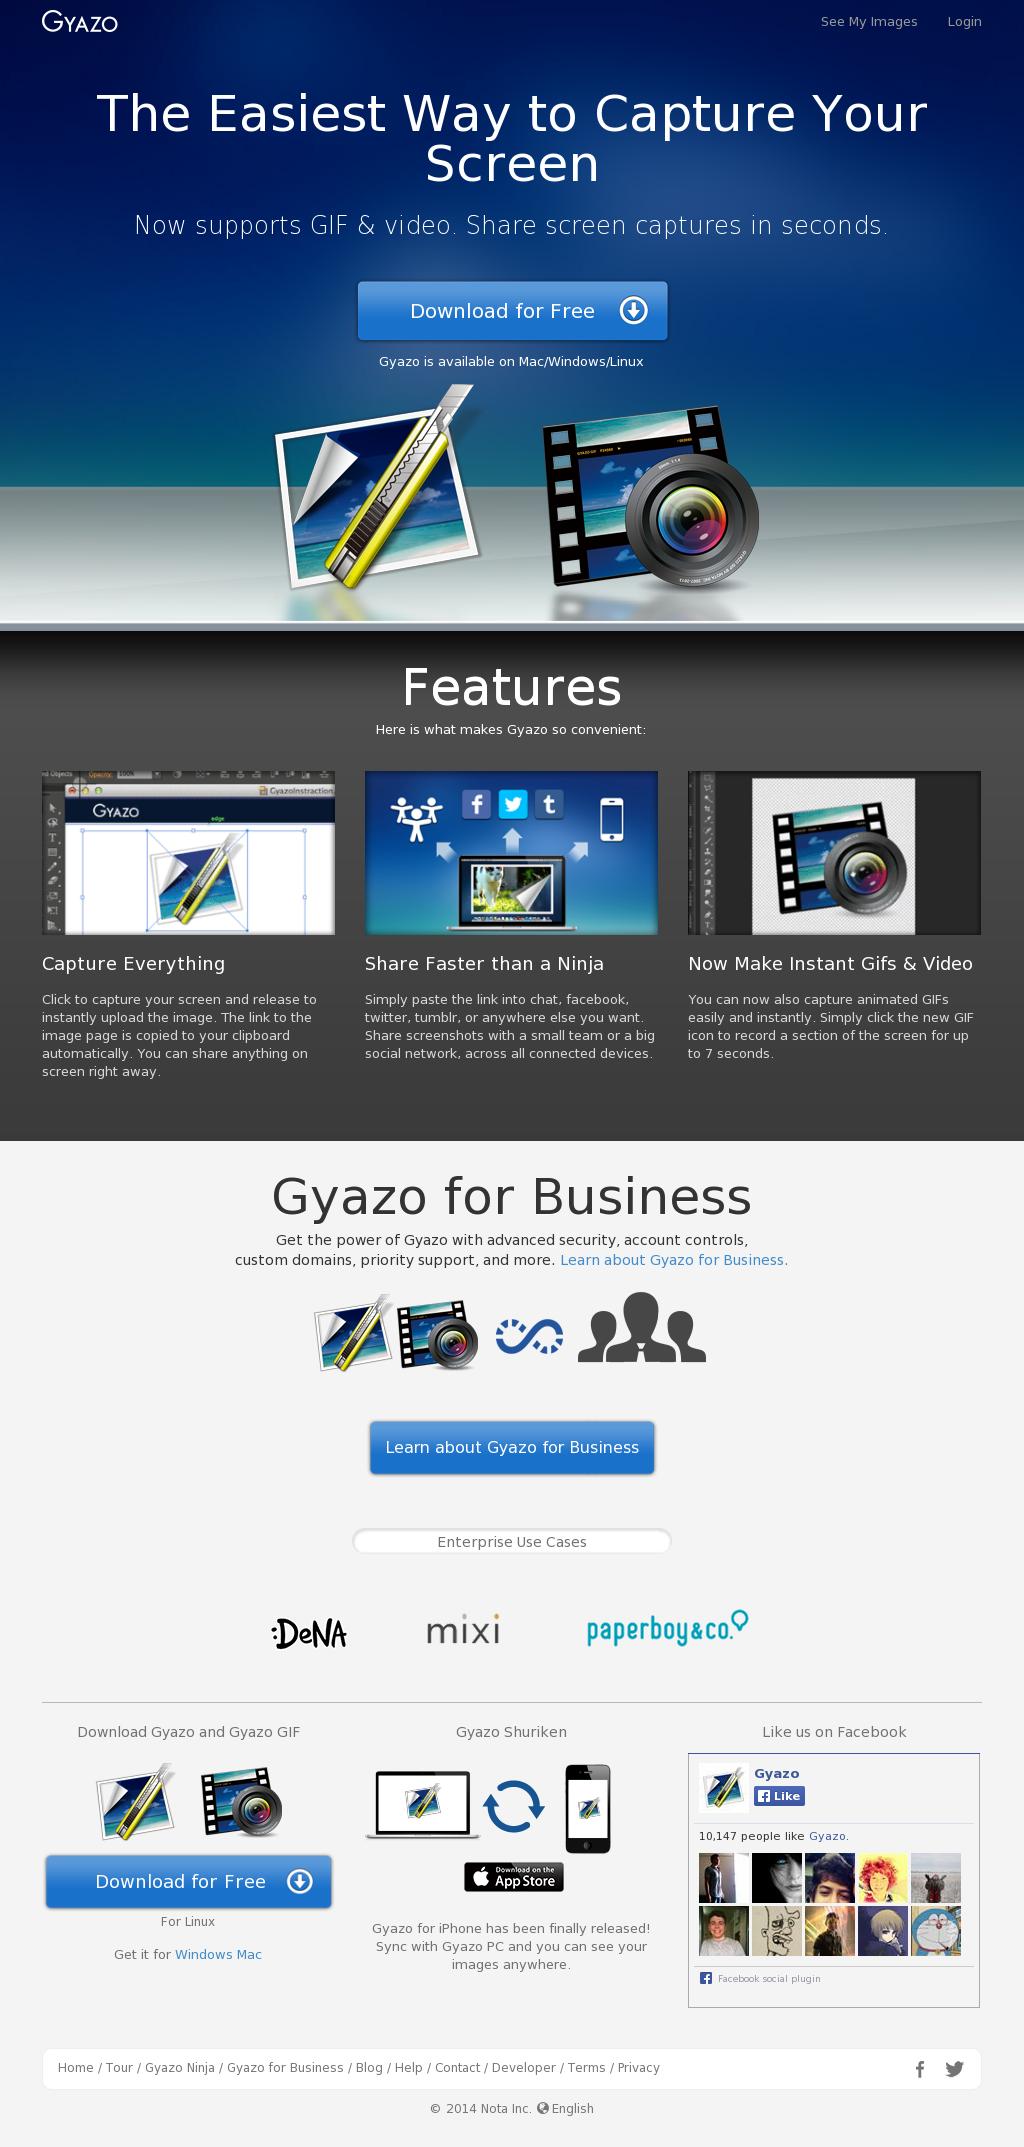 gyazo video capture